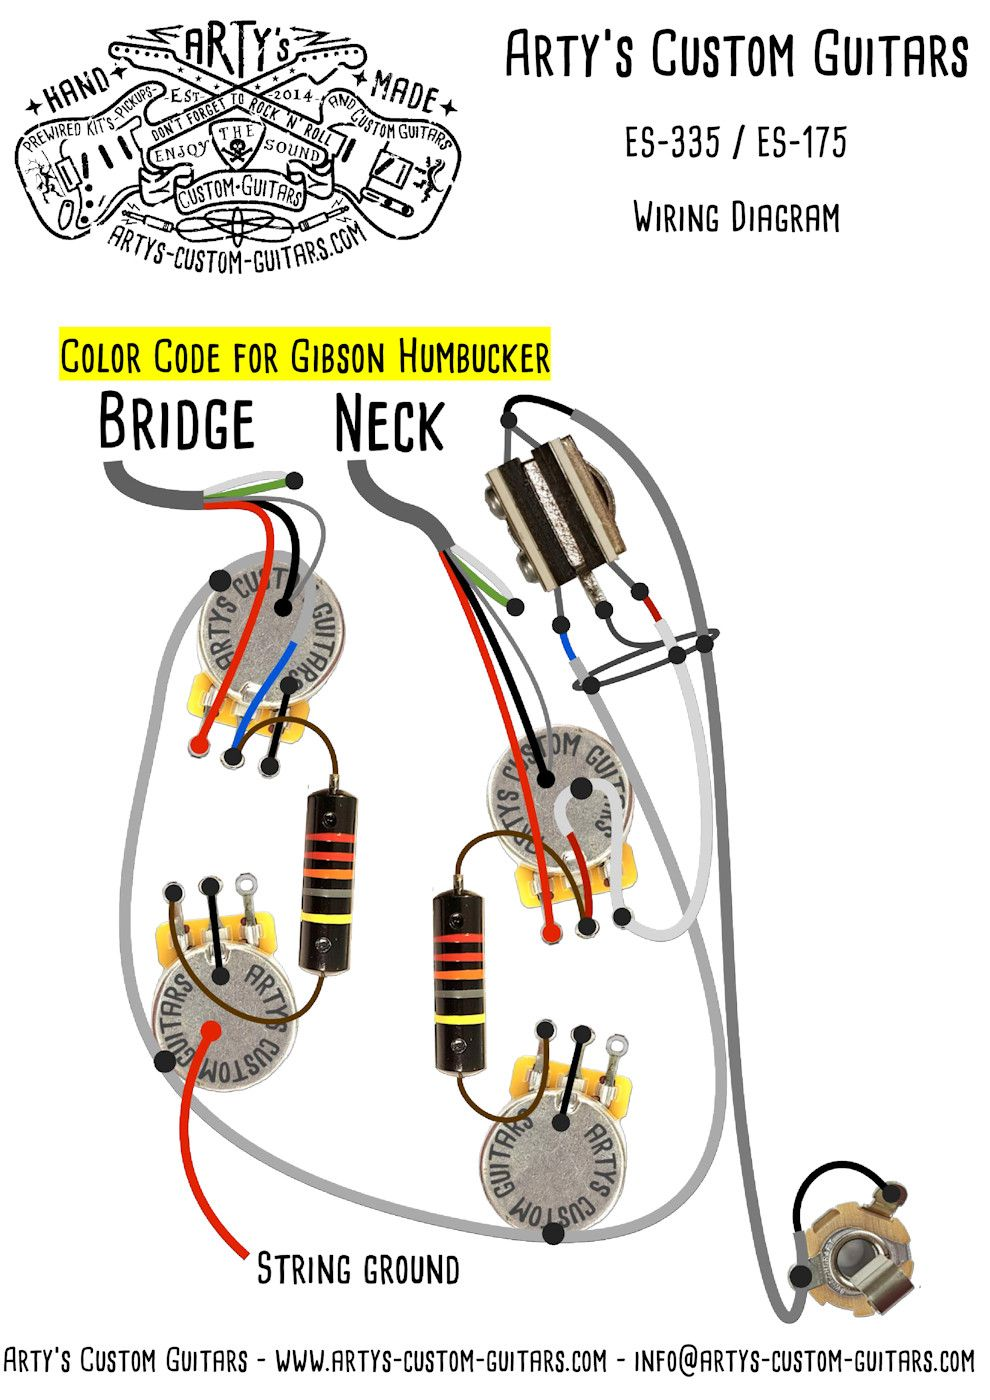 small resolution of wiring diagram es 335 es 330 arty s custom guitars gibson es 335